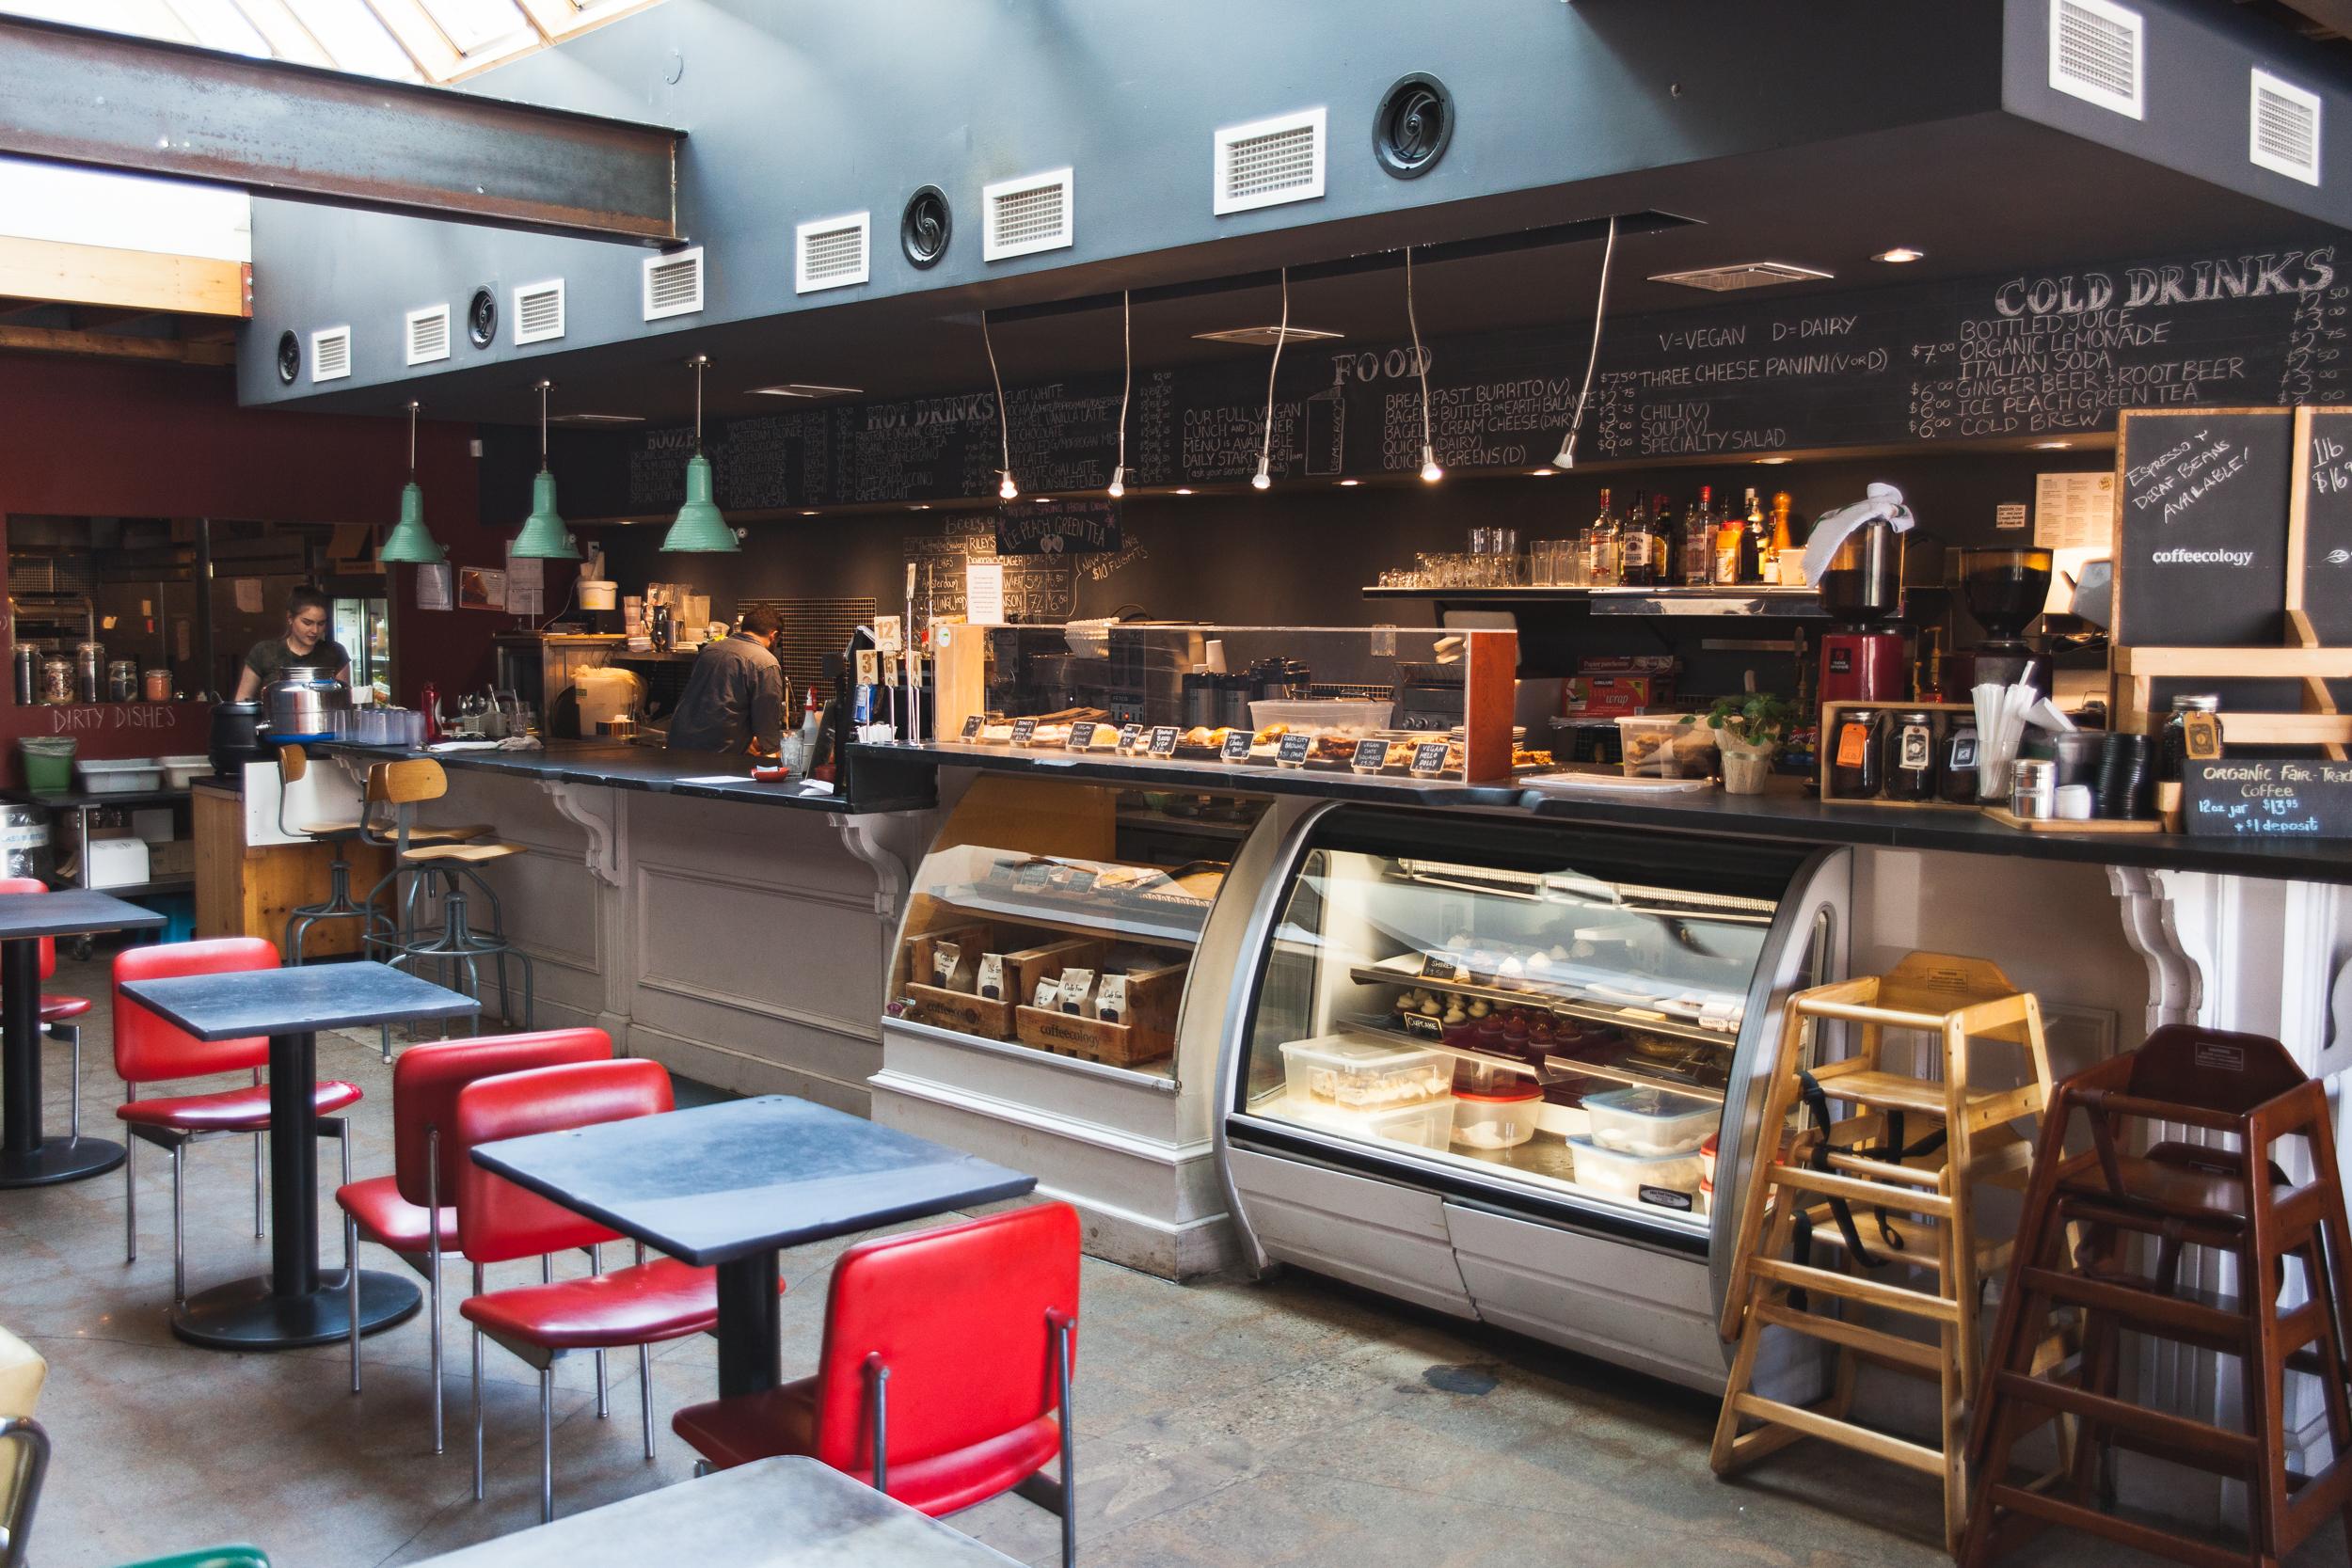 Democracy Coffee House